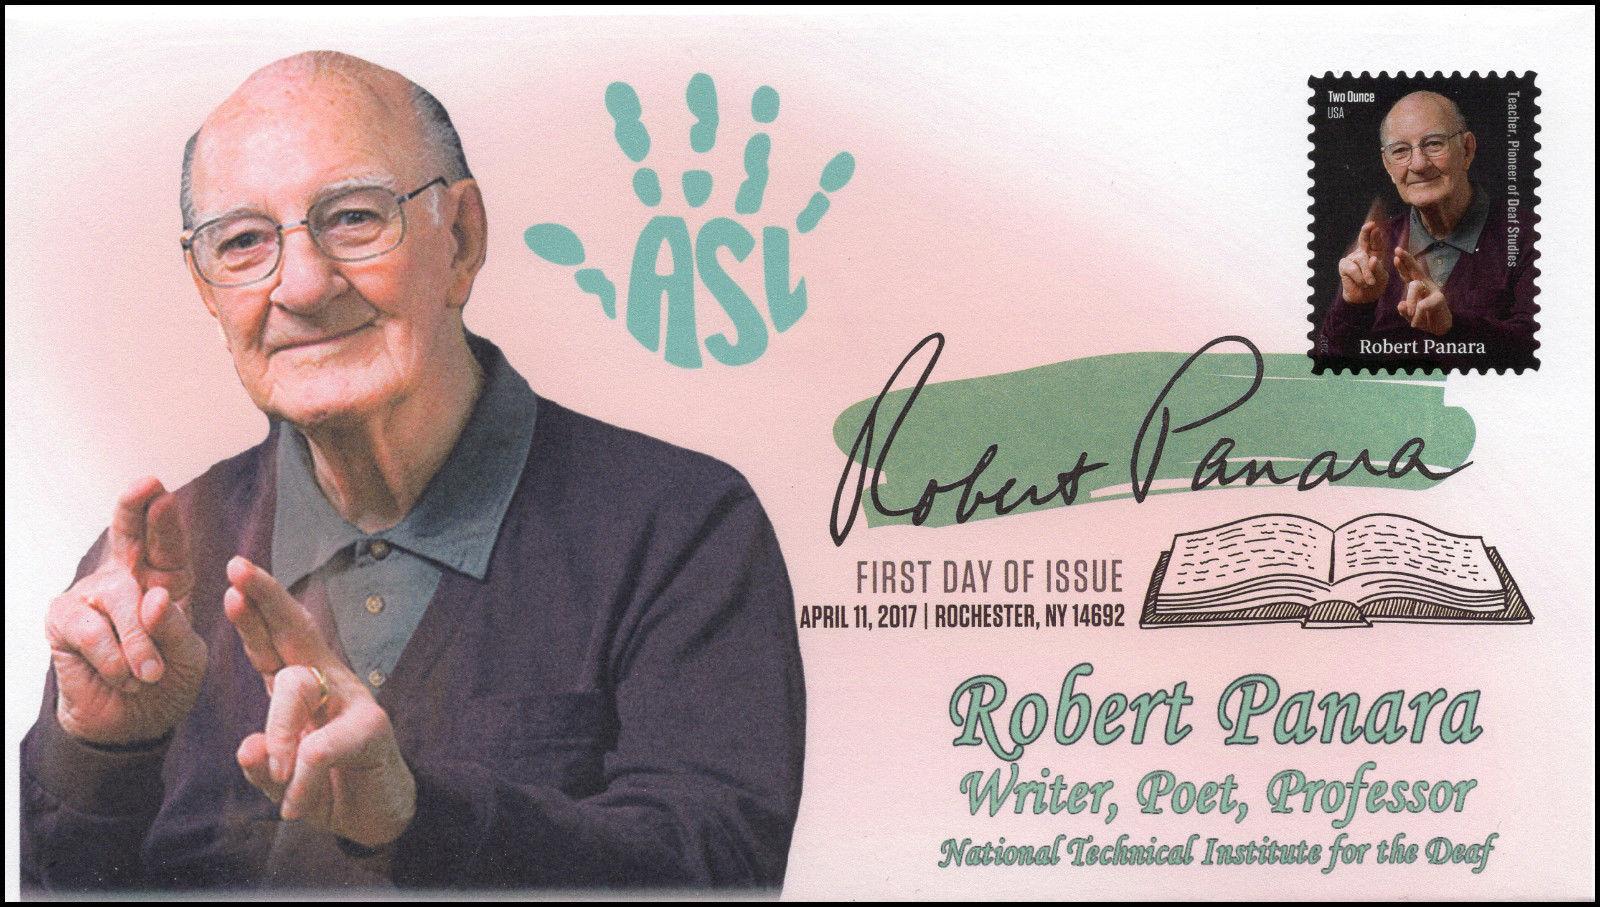 17 088 2017 Robert Panara Writer Poet Educator FDC DCP